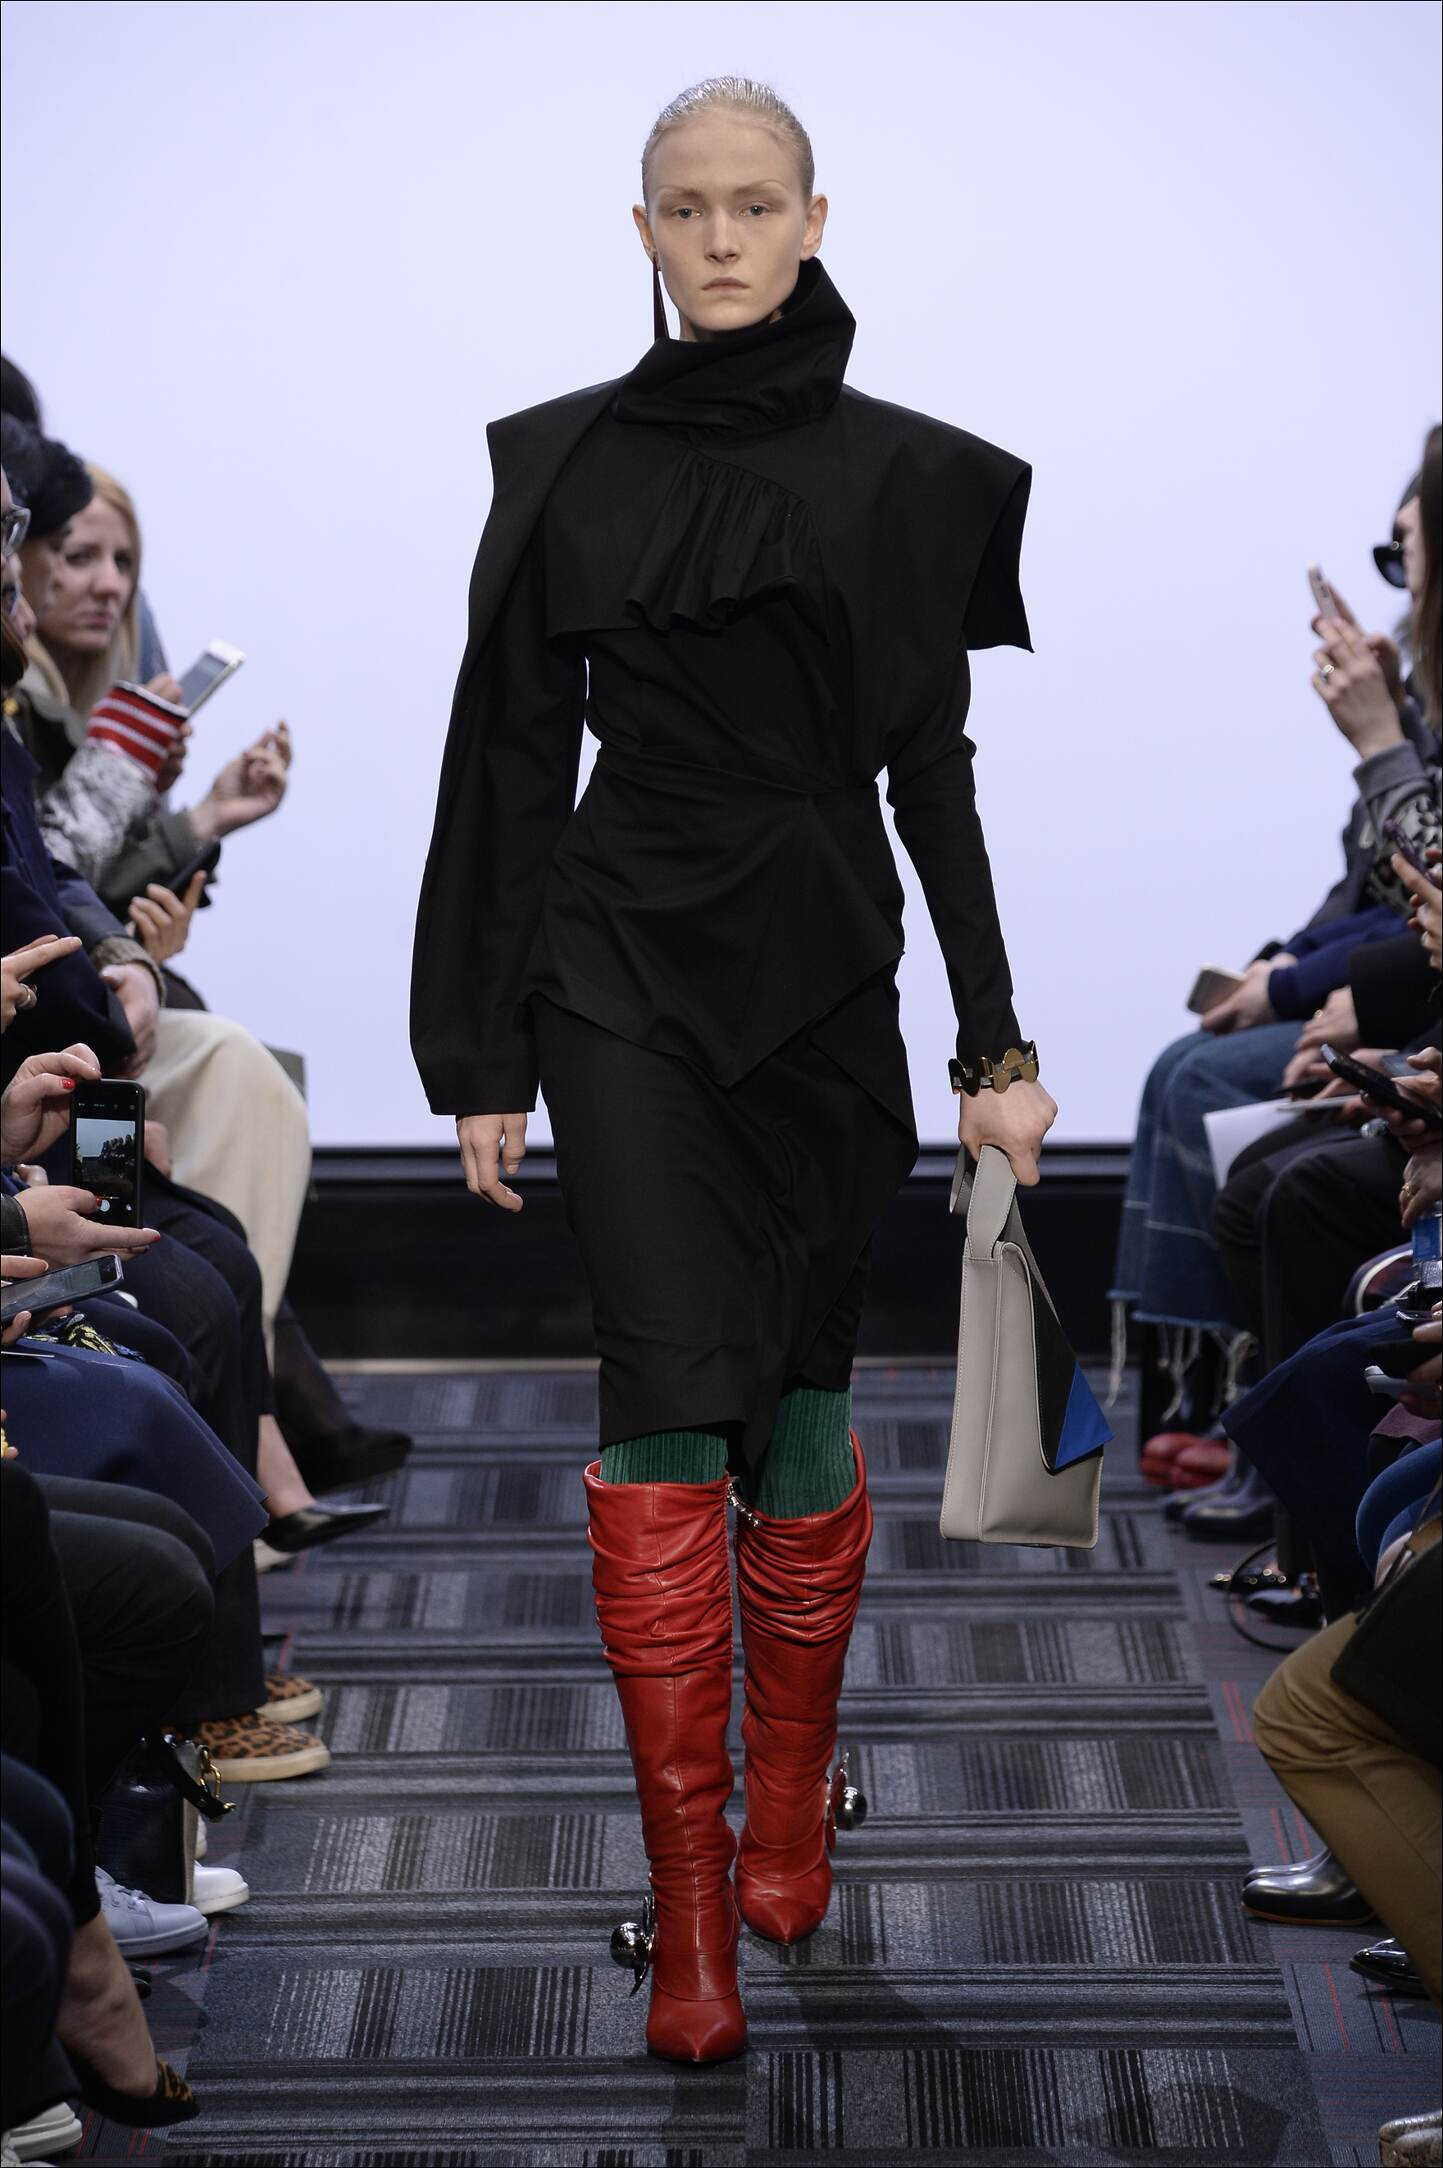 Catwalk J.W. Anderson Womenswear Collection Winter 2015